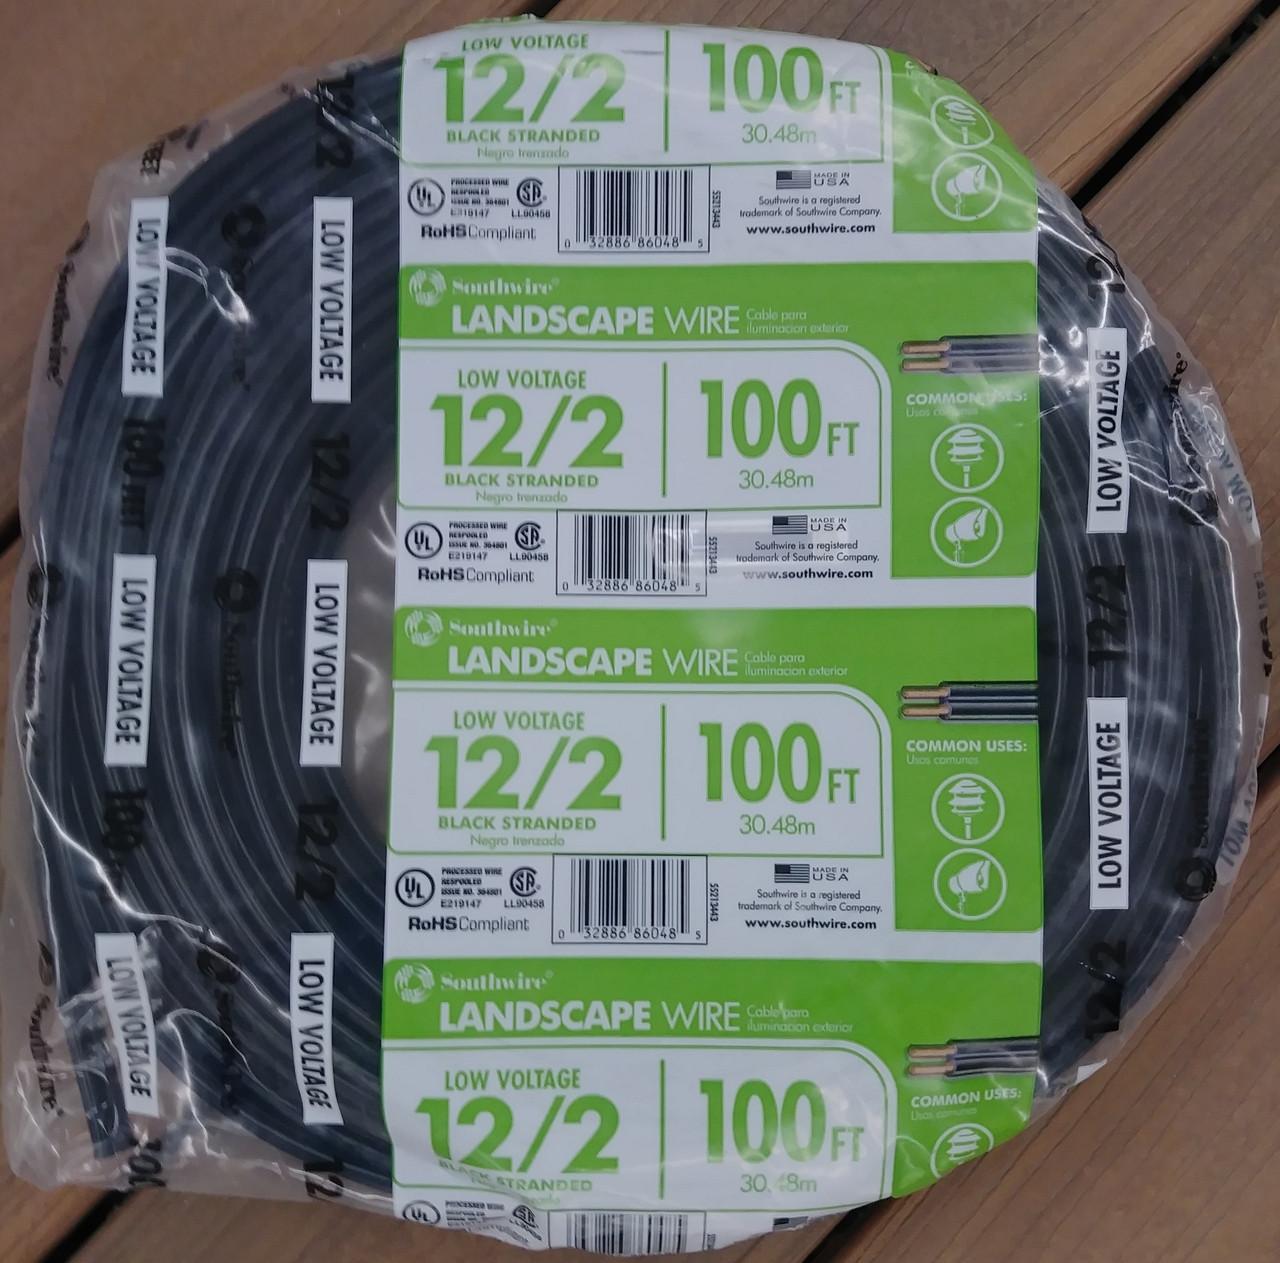 Southwire Landscape Wire 100 ft. Low Voltage 12/2 Black Stranded